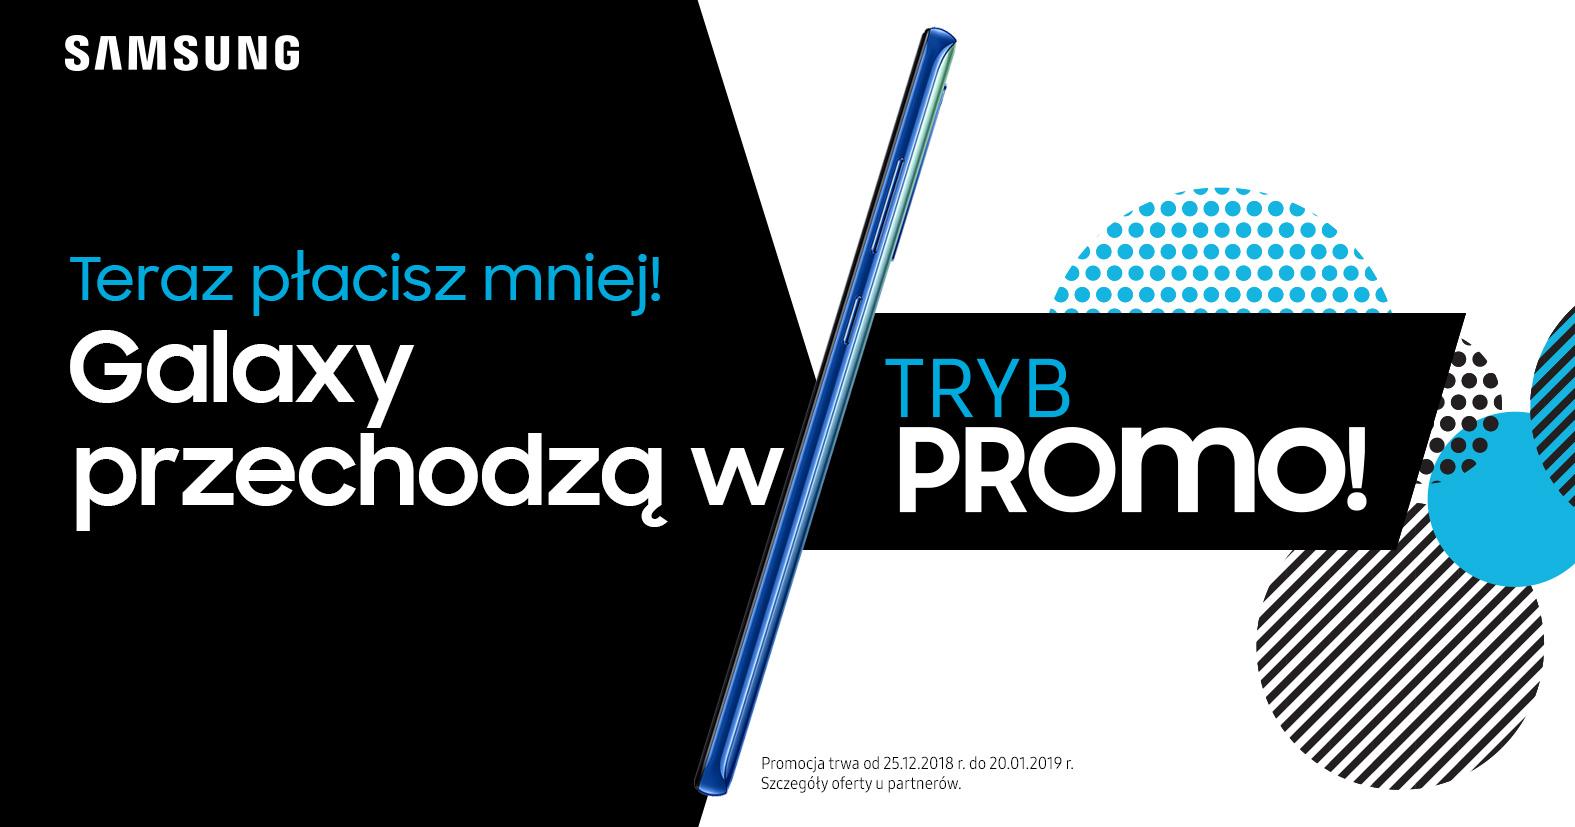 tryb promo